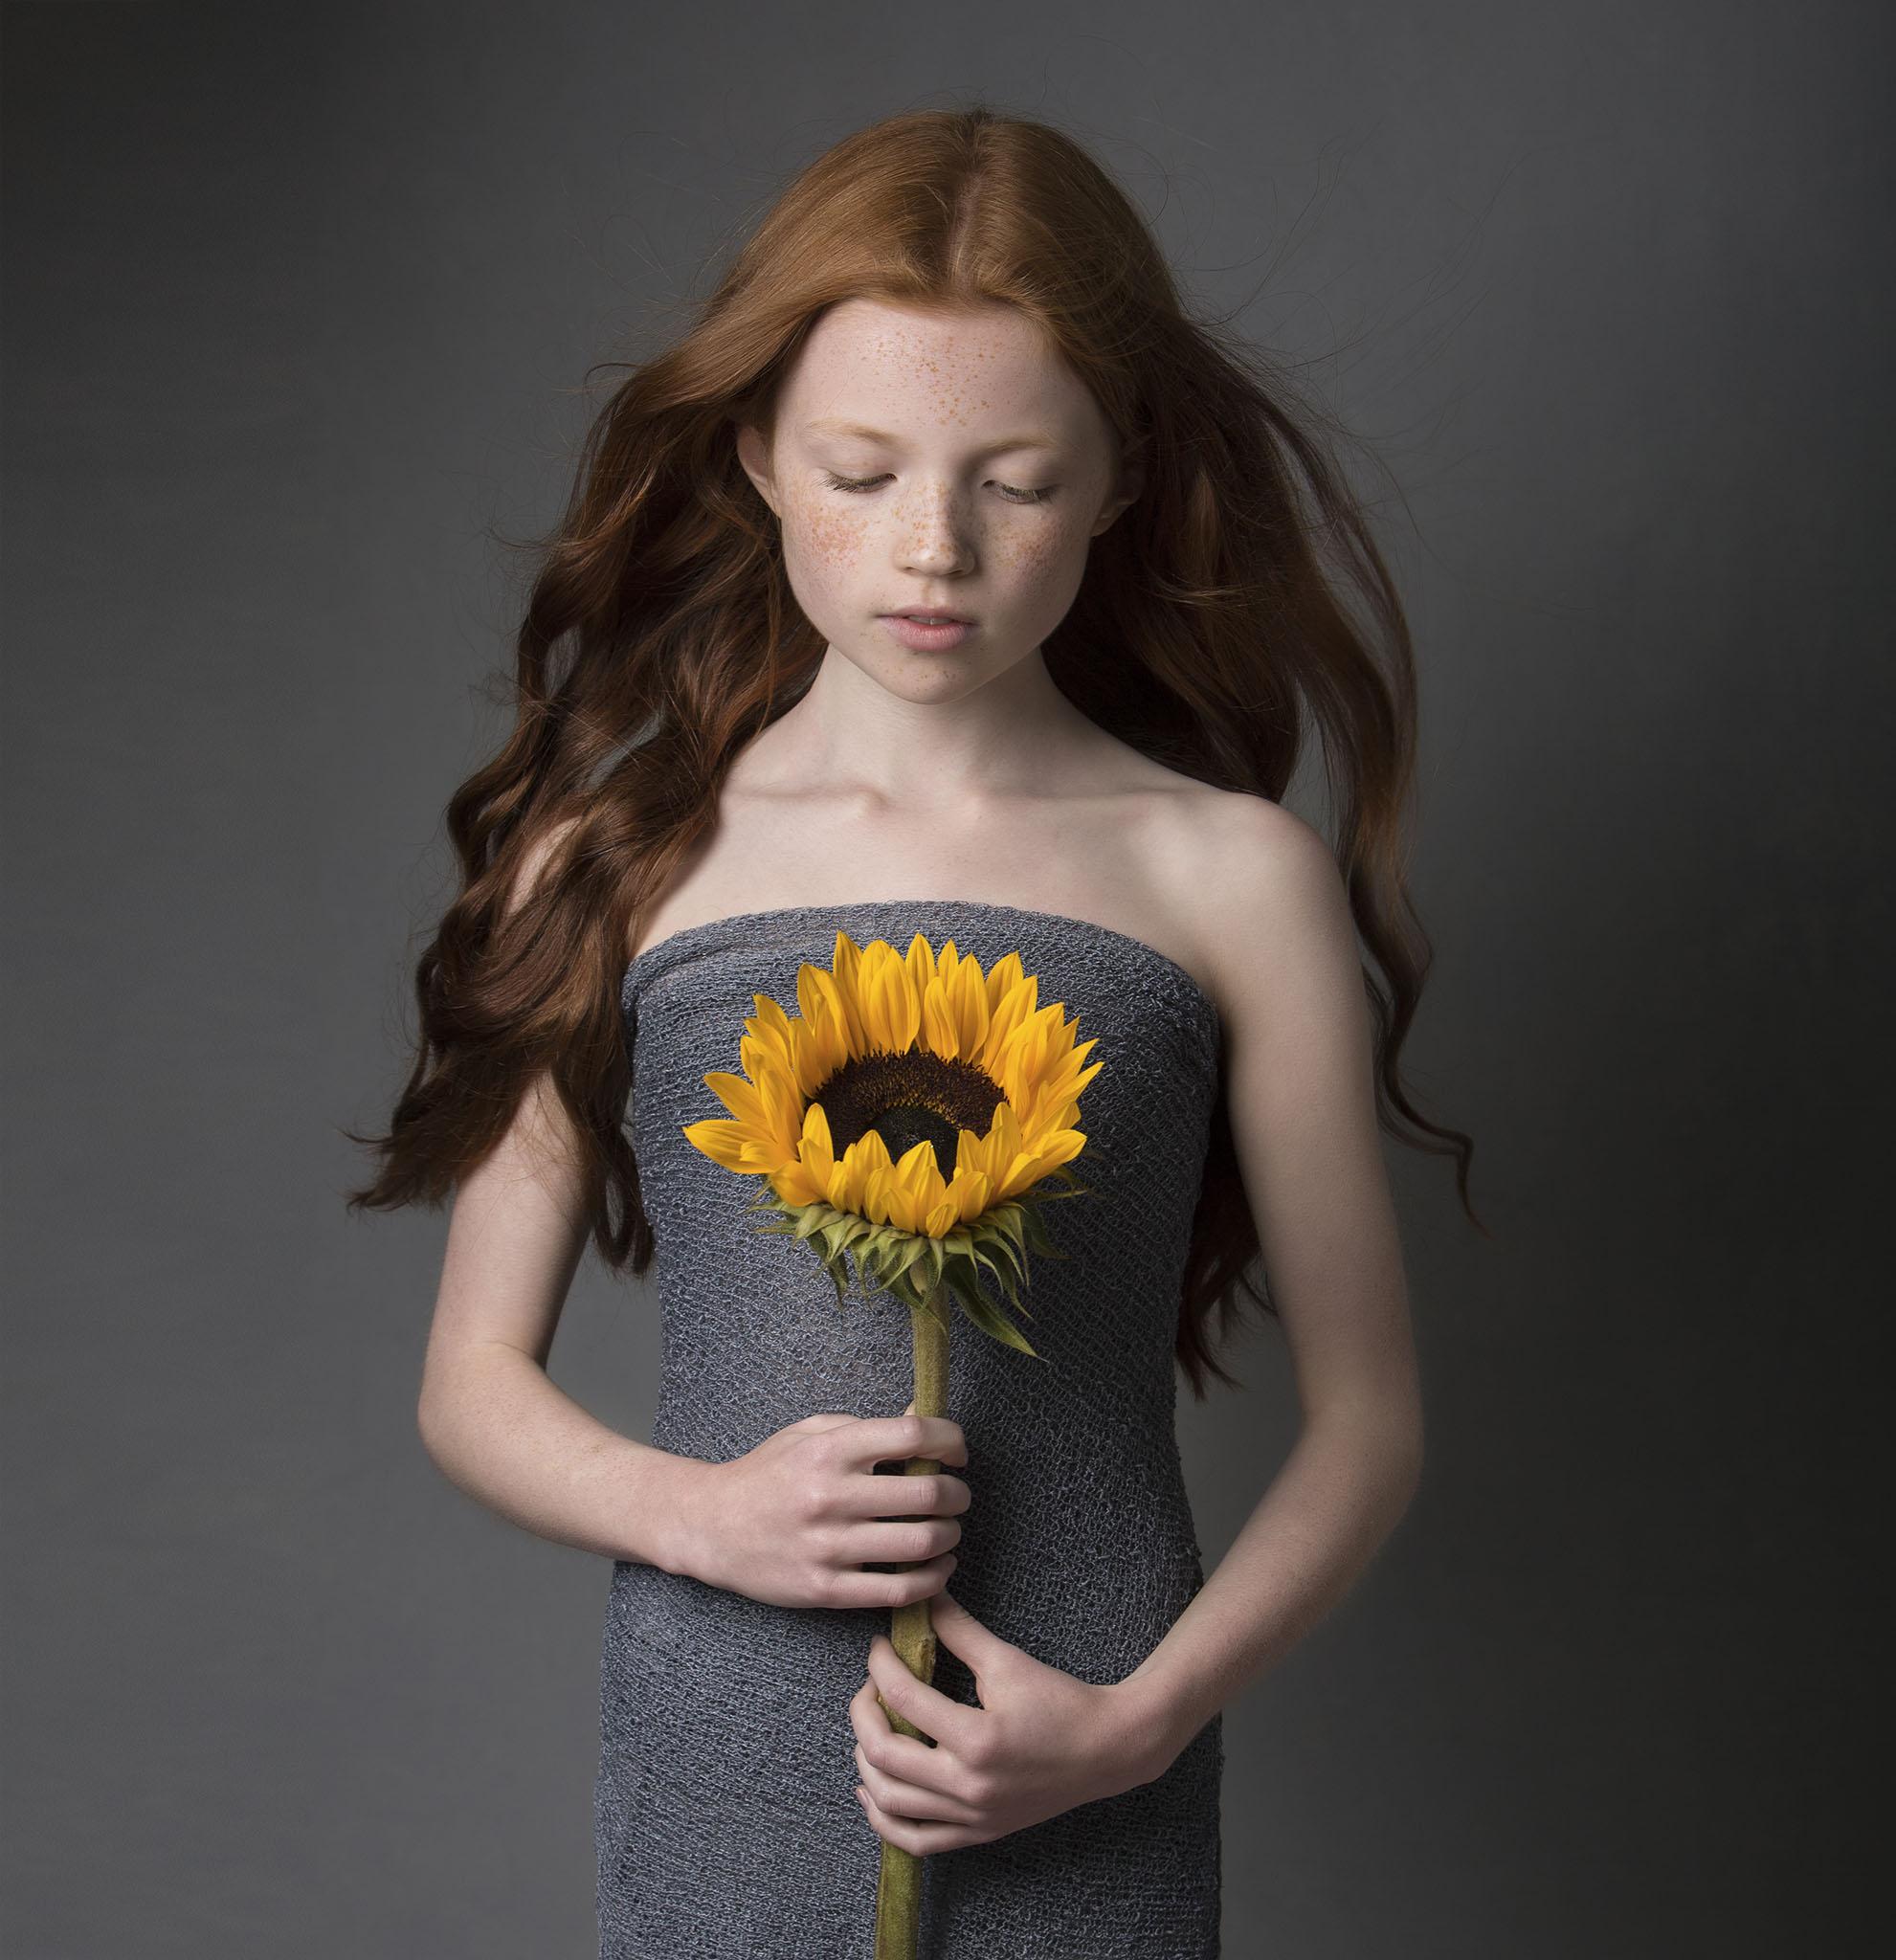 elizabethgphotography_kingslangley_hertfordshire_fineart_childrens_photography_62.jpg